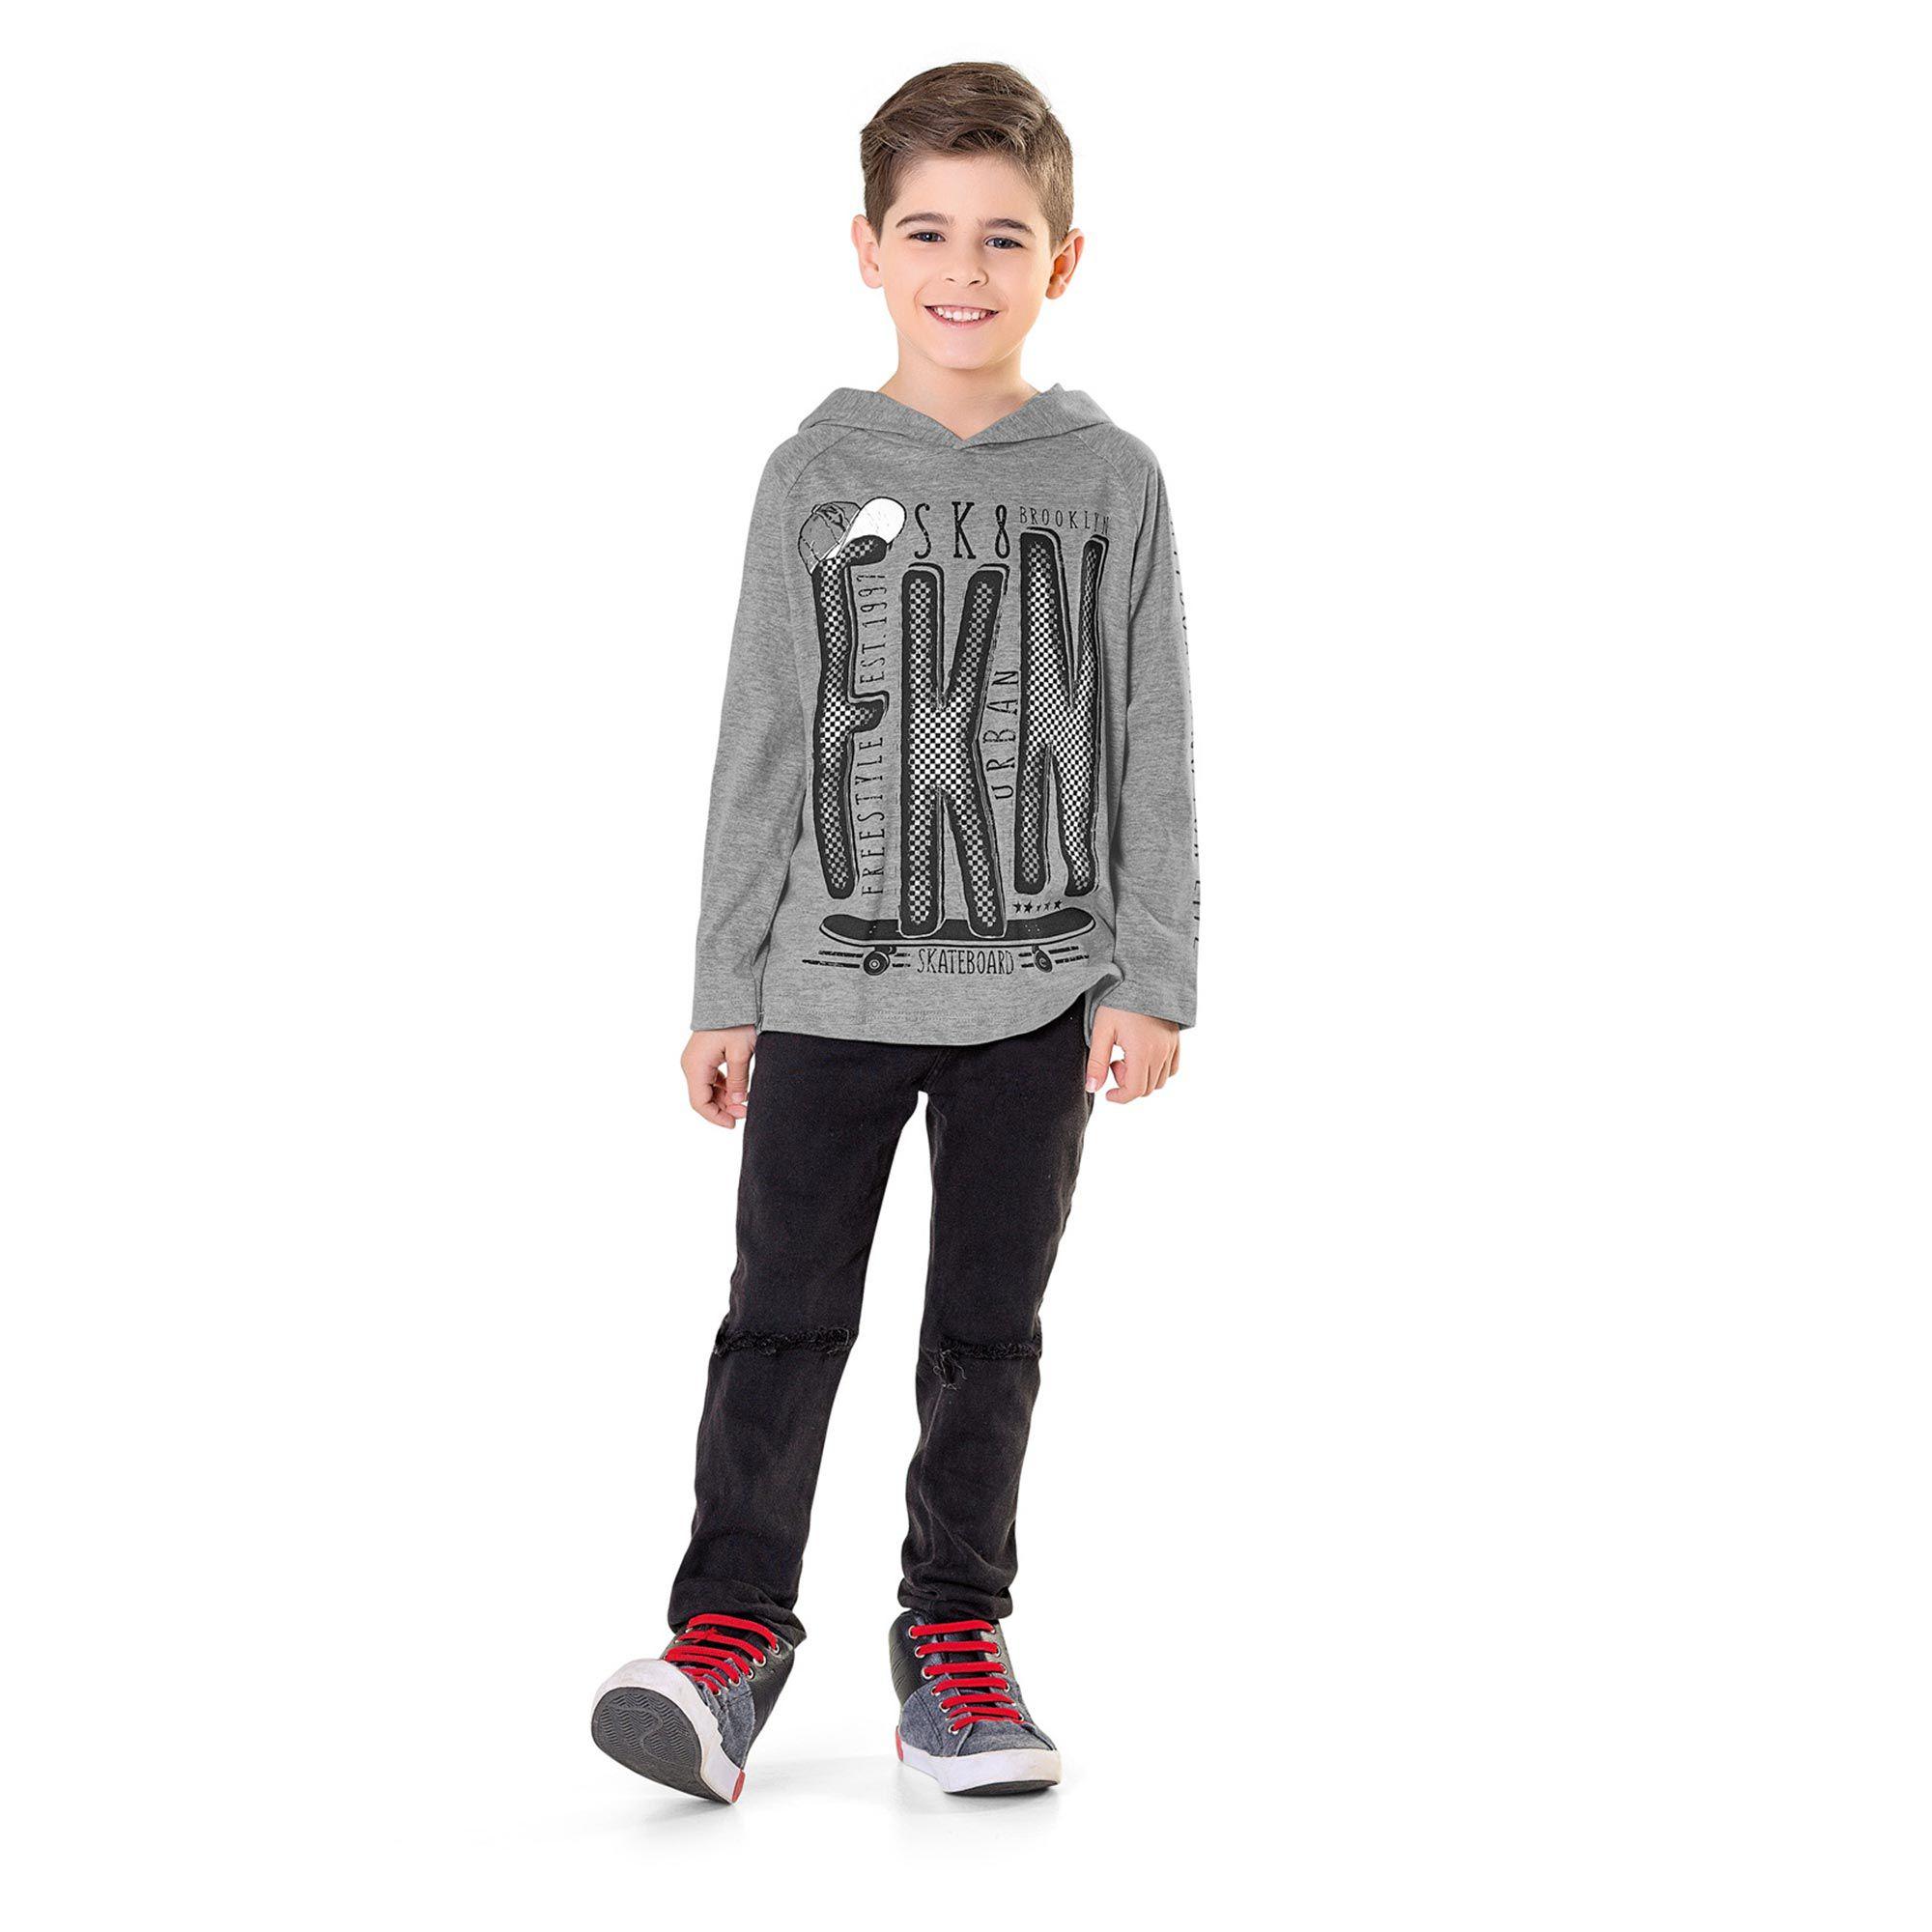 Camiseta Manga Longa Infantil com Capuz Fakini - Sk8 Mescla